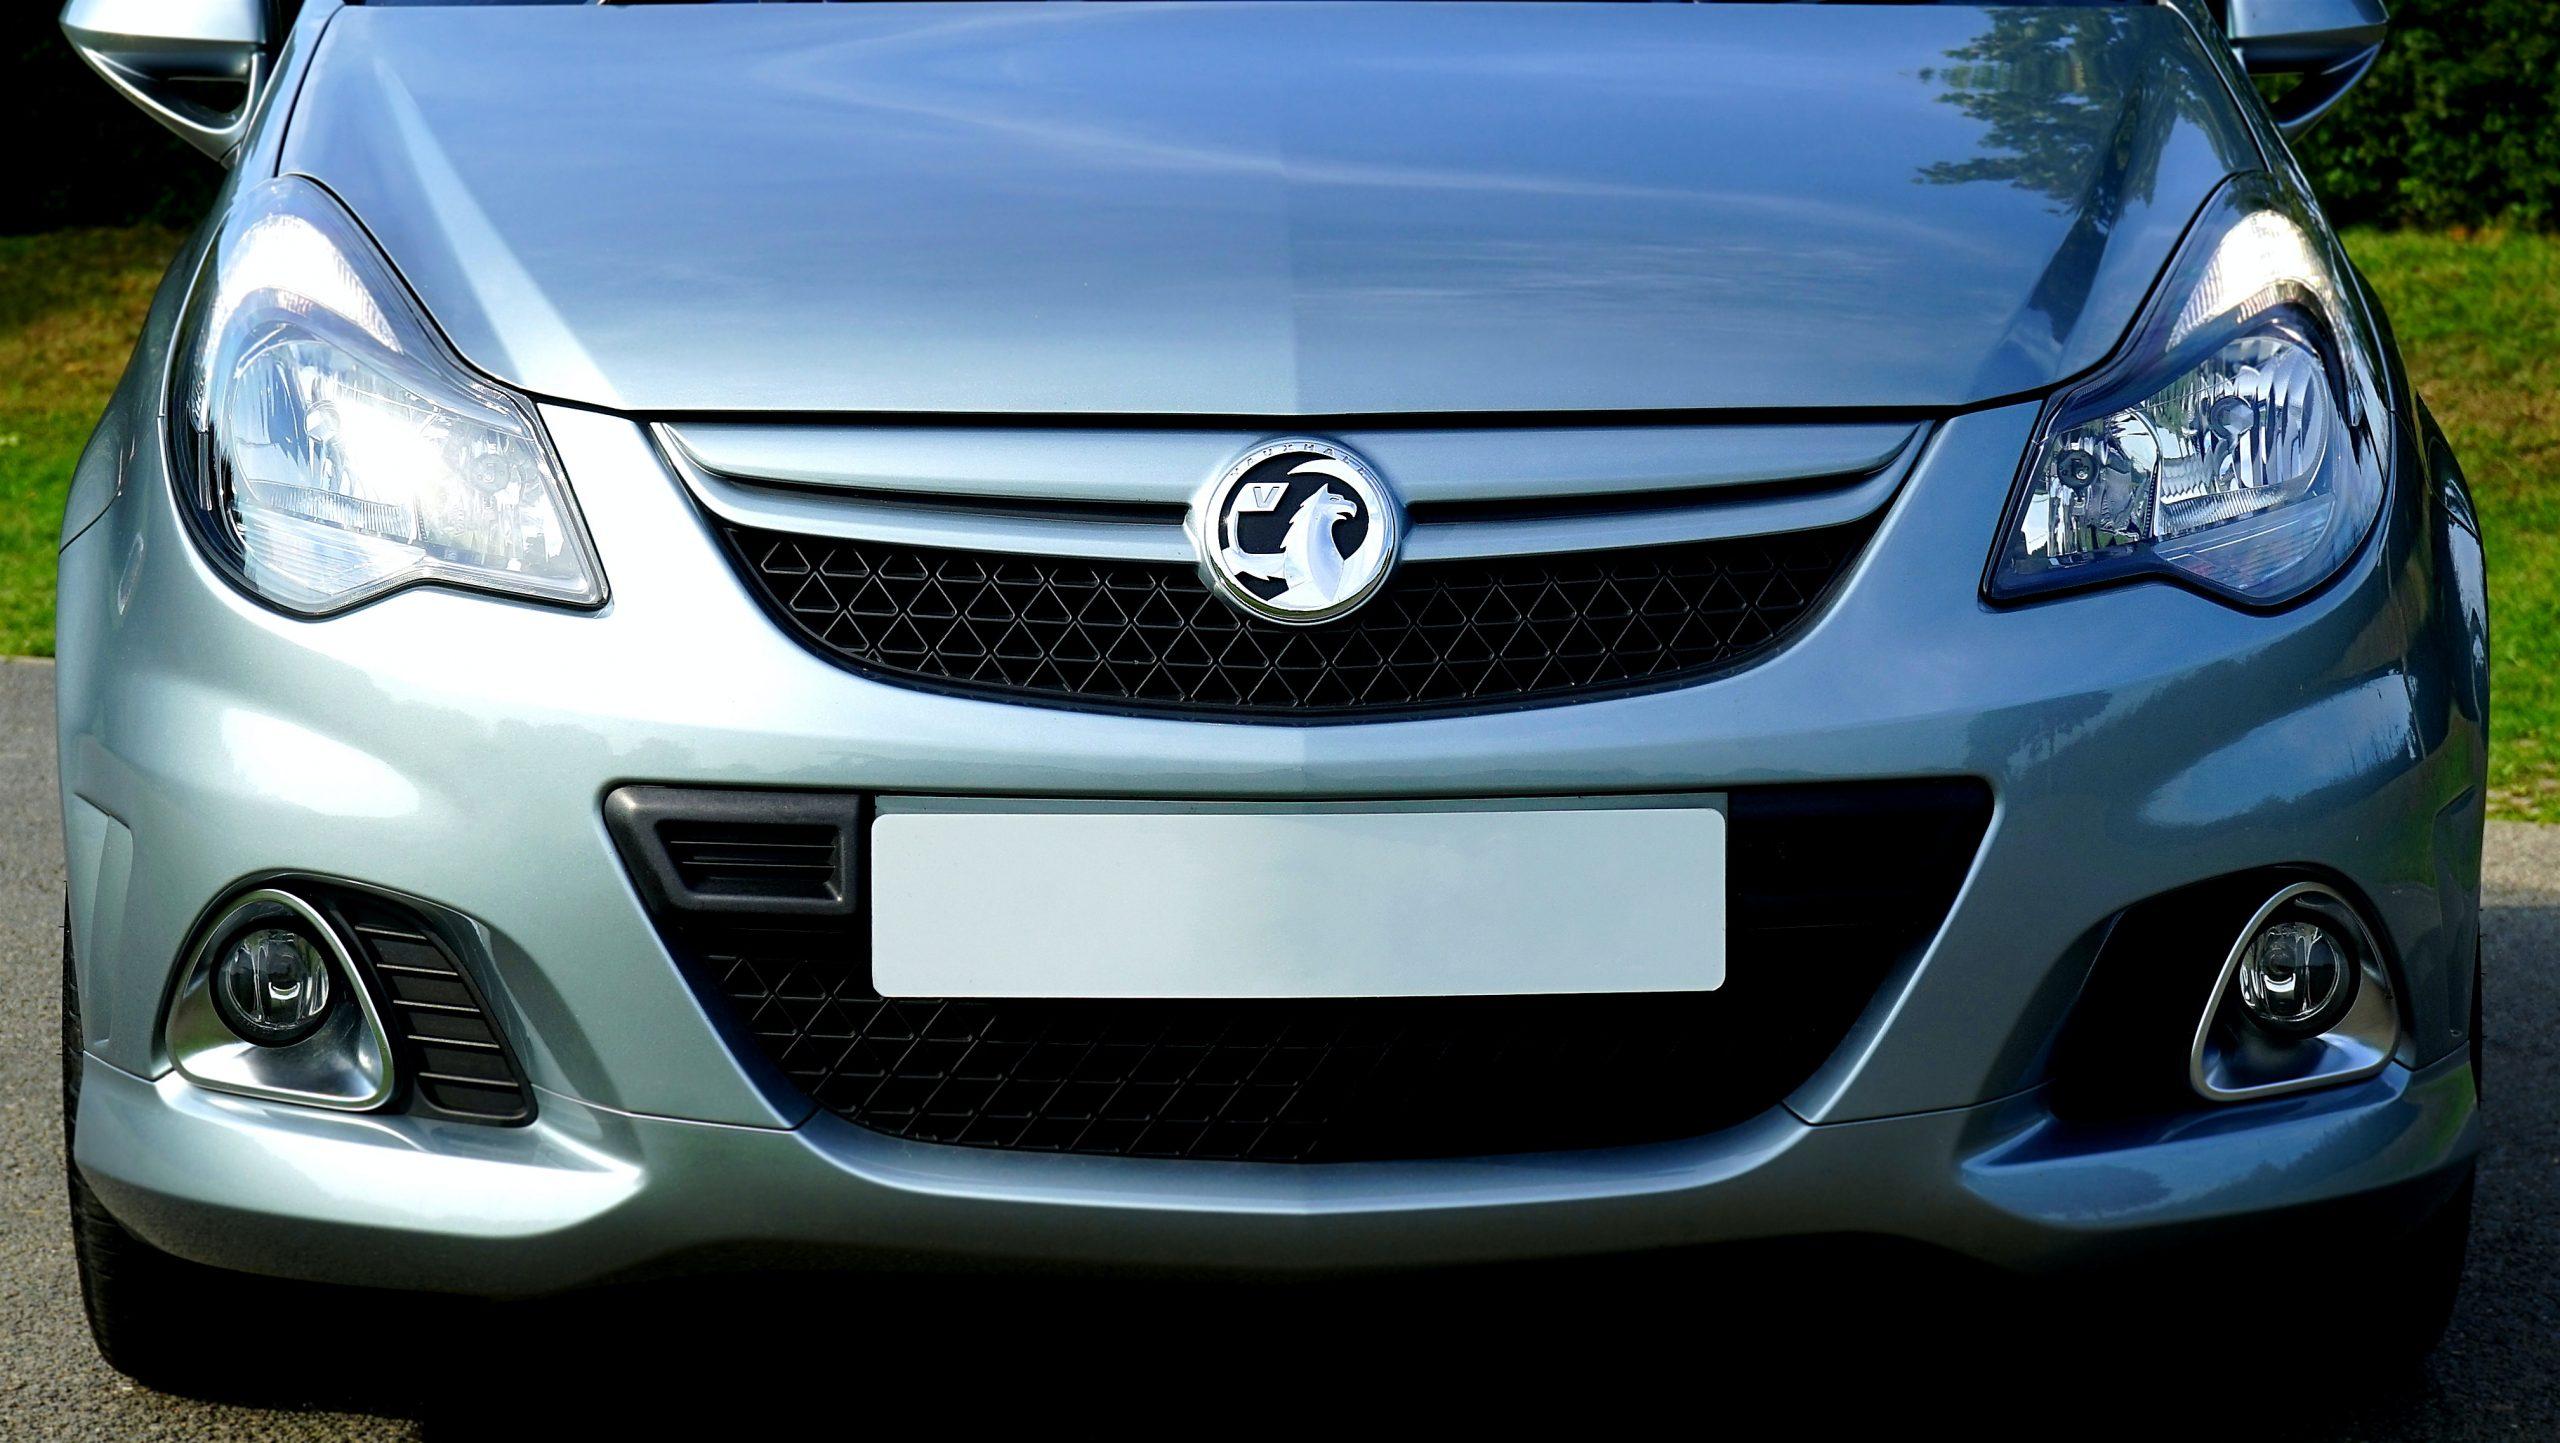 webuyyourcars 墨尔本 - 二手车